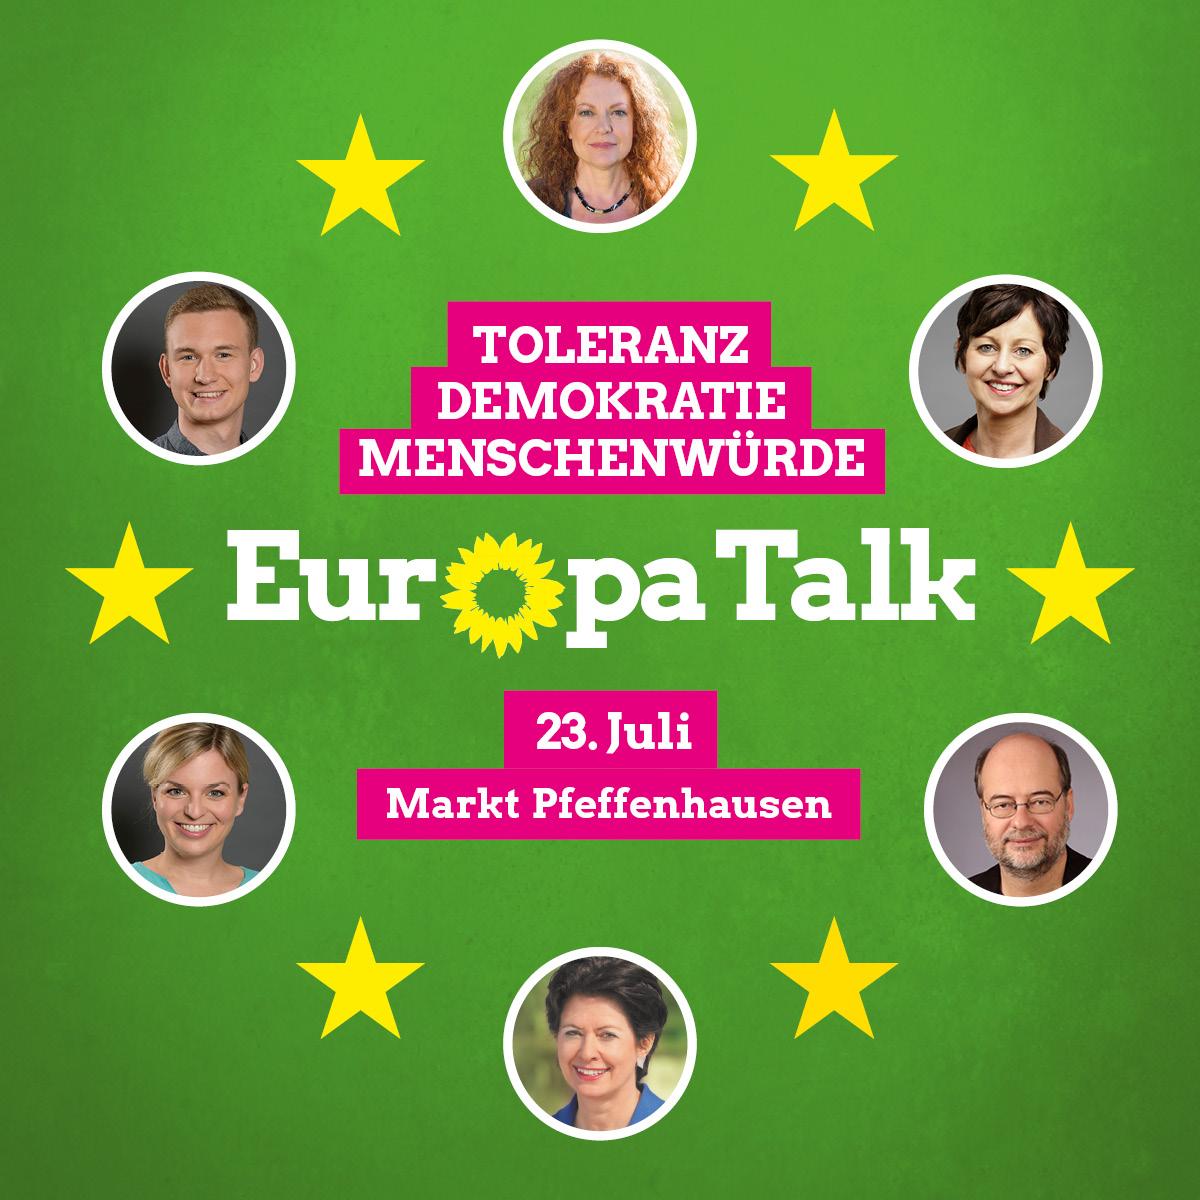 EuropaTalk in Pfeffenhausen